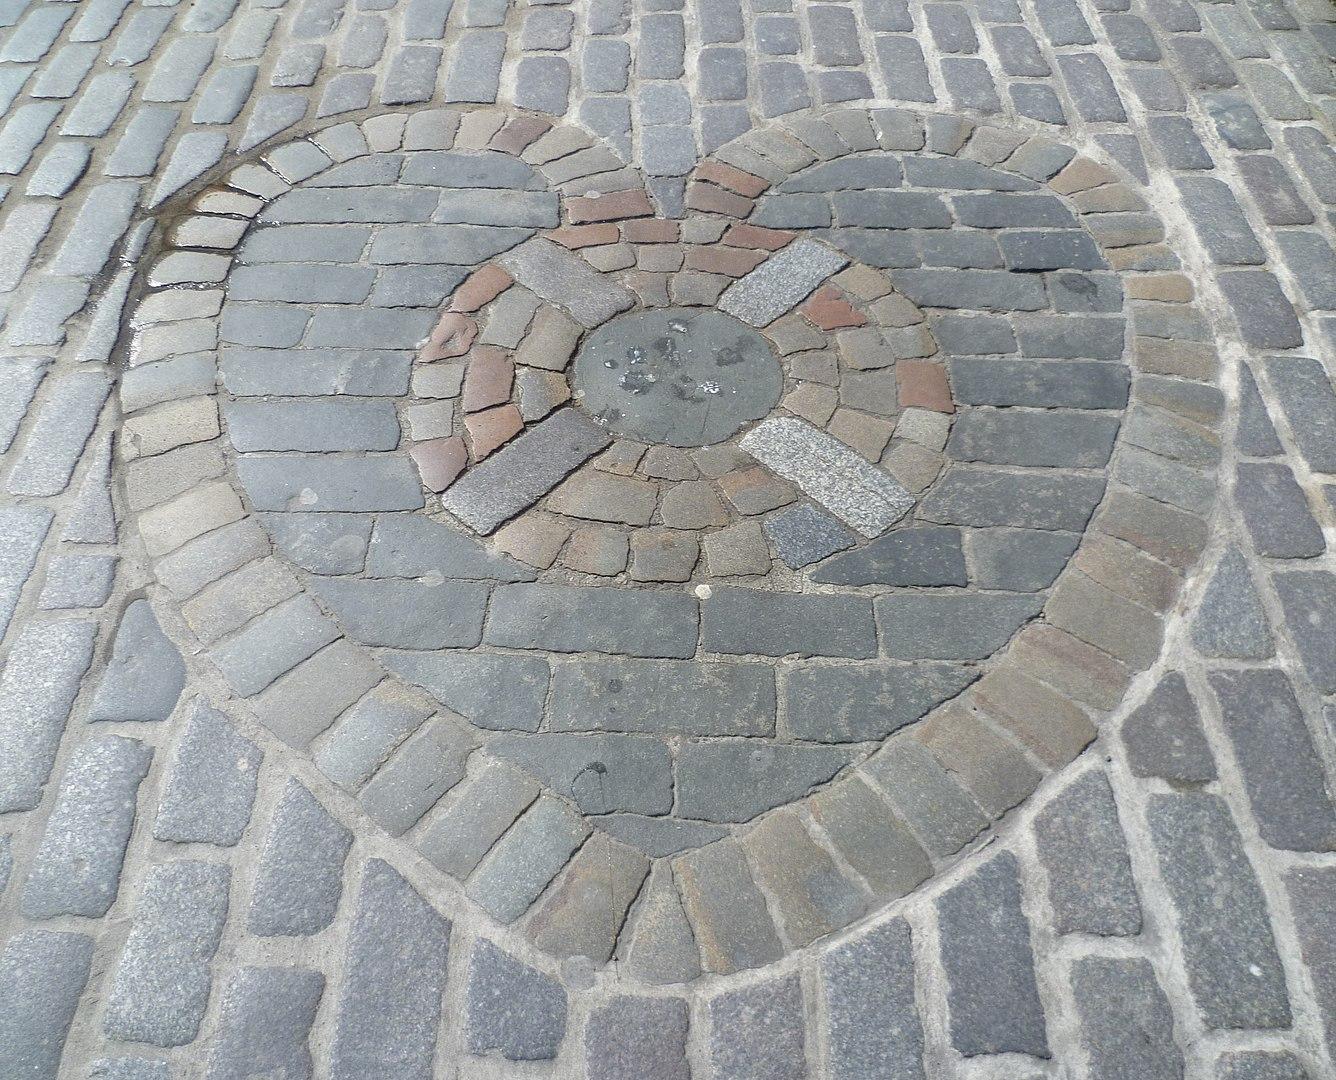 The Heart of Midlothian mosaic for football crest blog